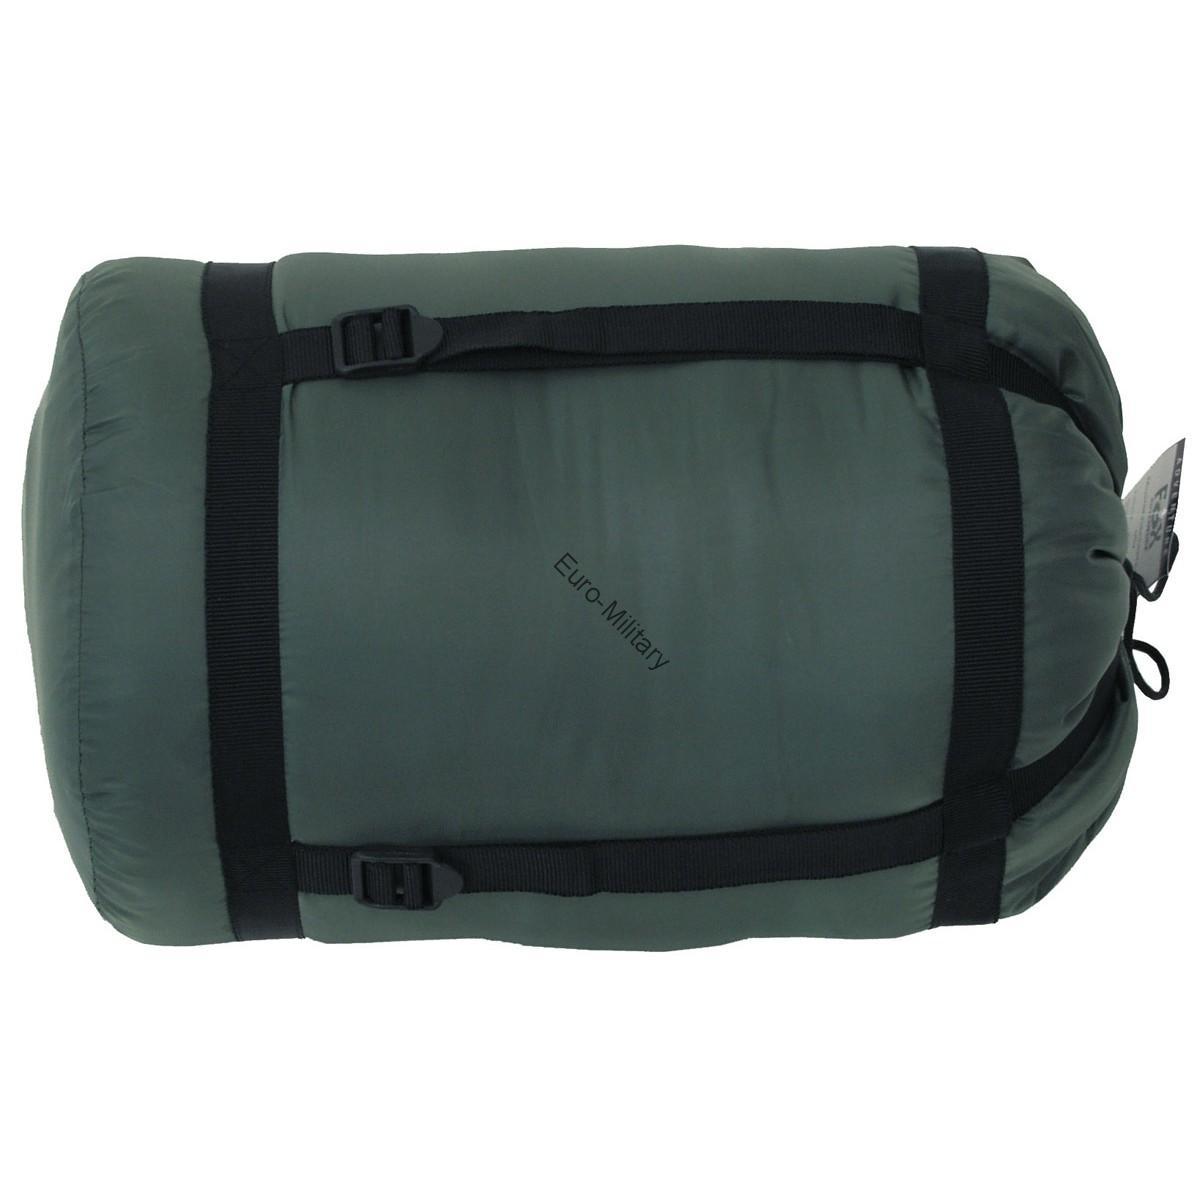 Camping Quartermaster: Military Sleeping Bag - Lining 450g Qm - OD Green